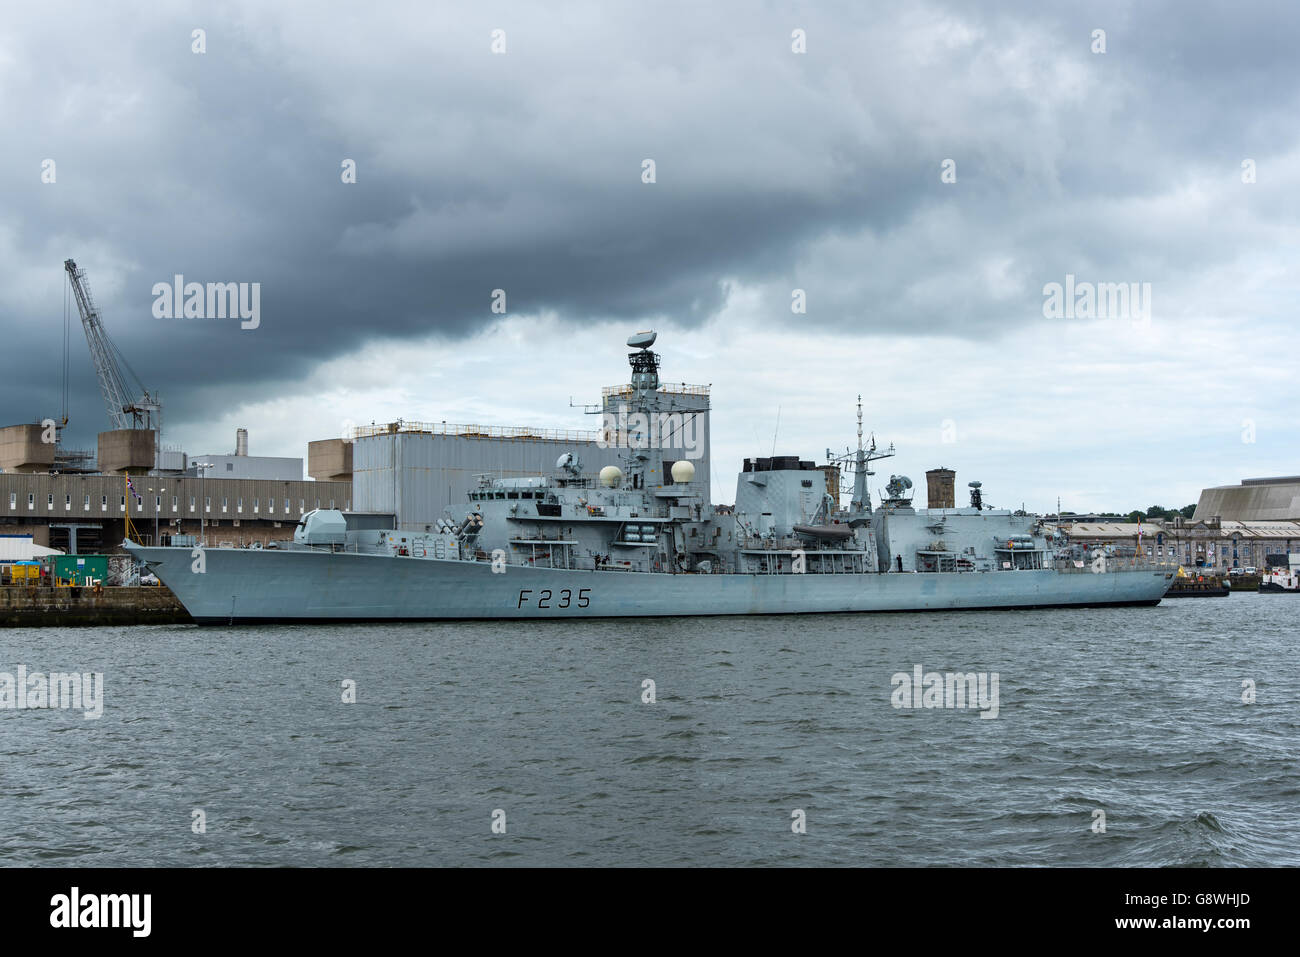 HMS Monmouth, a type 23 Frigate, at HMNB Devonport. - Stock Image